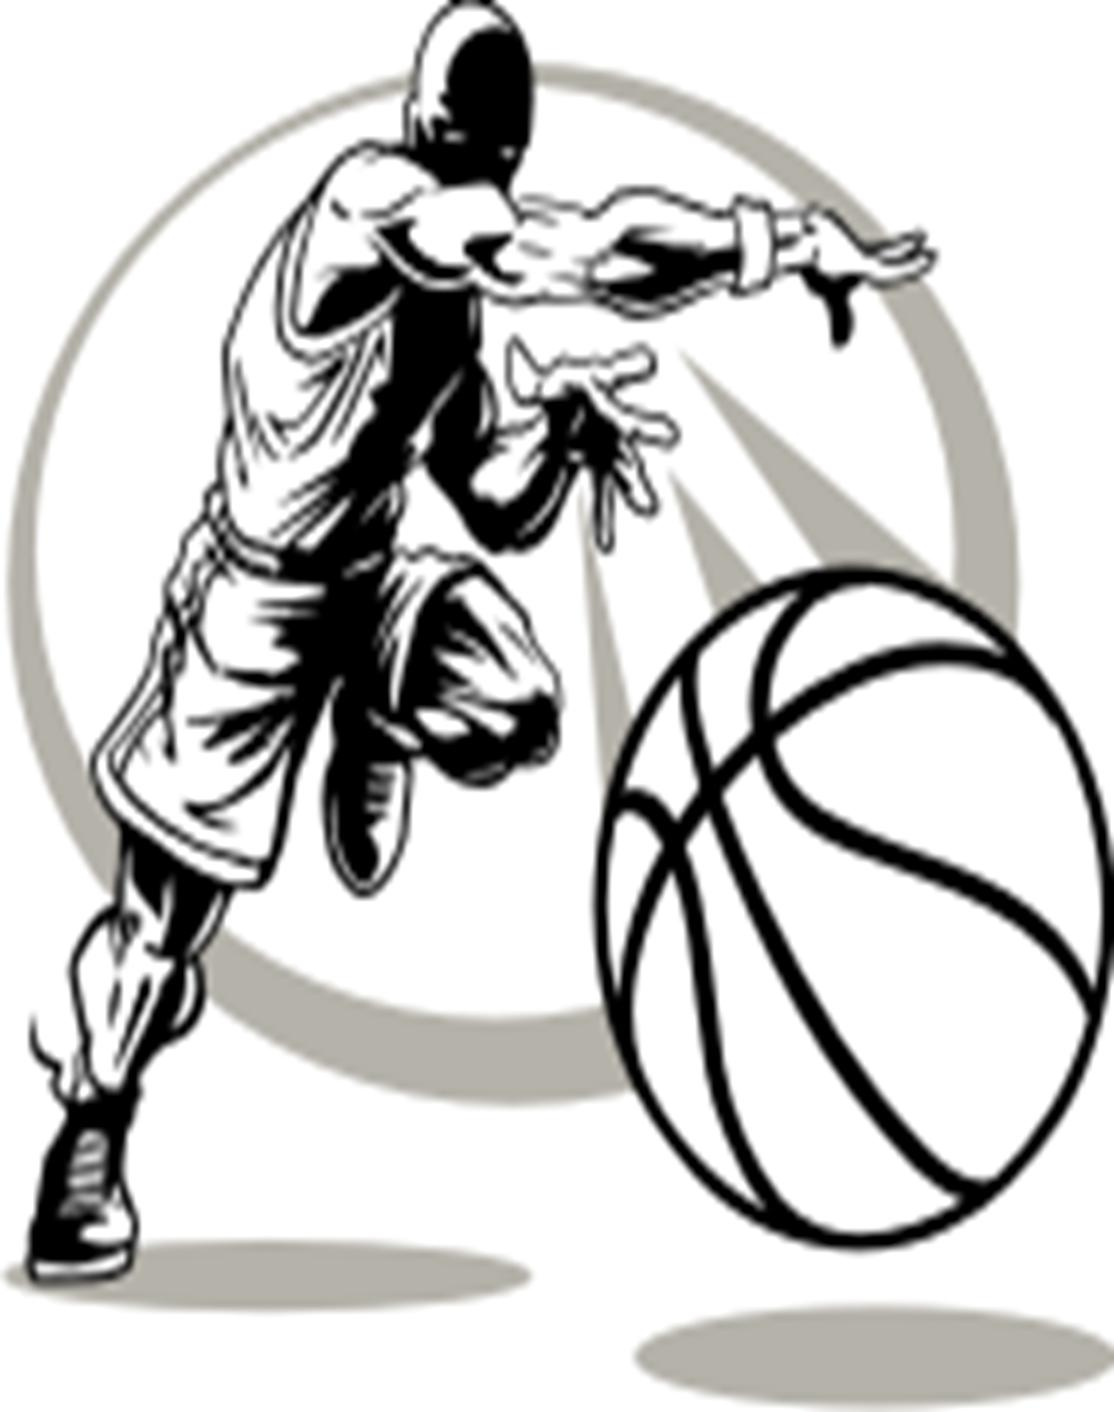 Basketball Line Drawing At Getdrawings